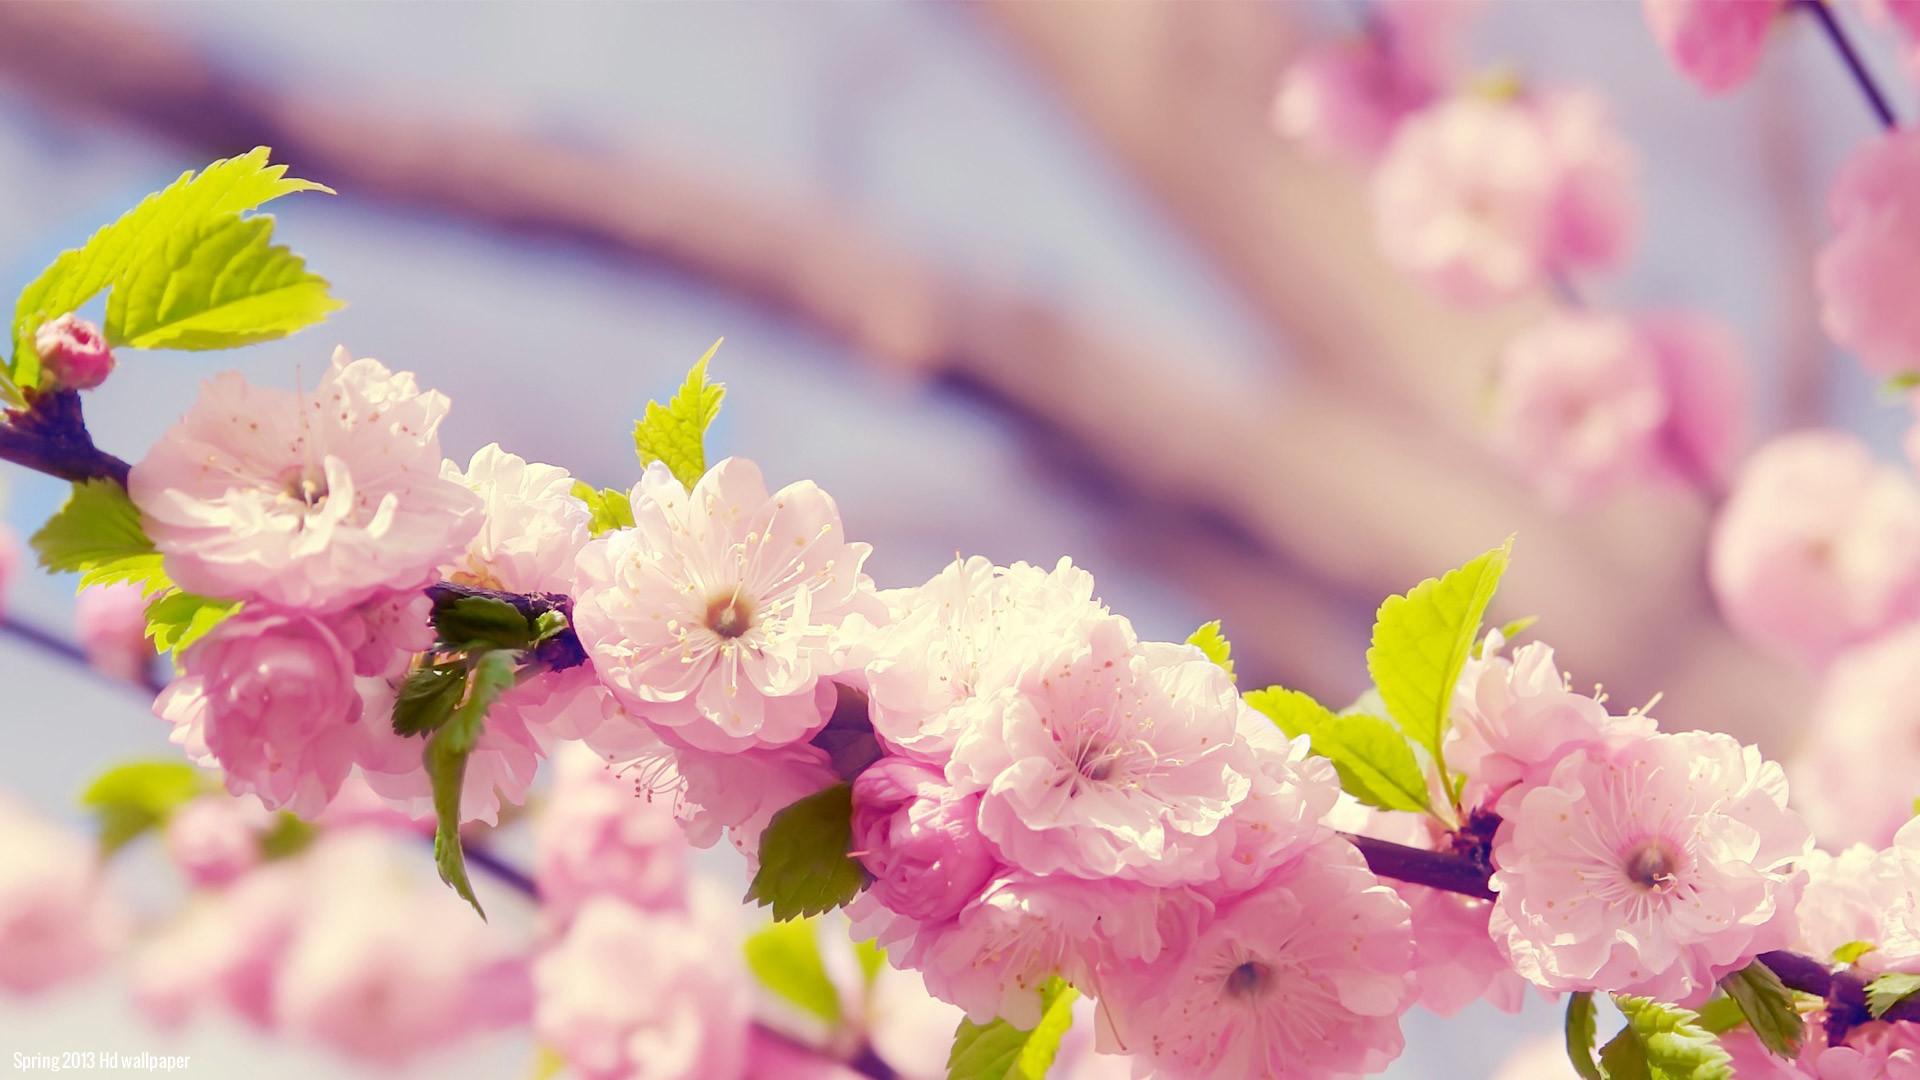 spring romantic flower wallpapers hd – https://69hdwallpapers.com/spring-